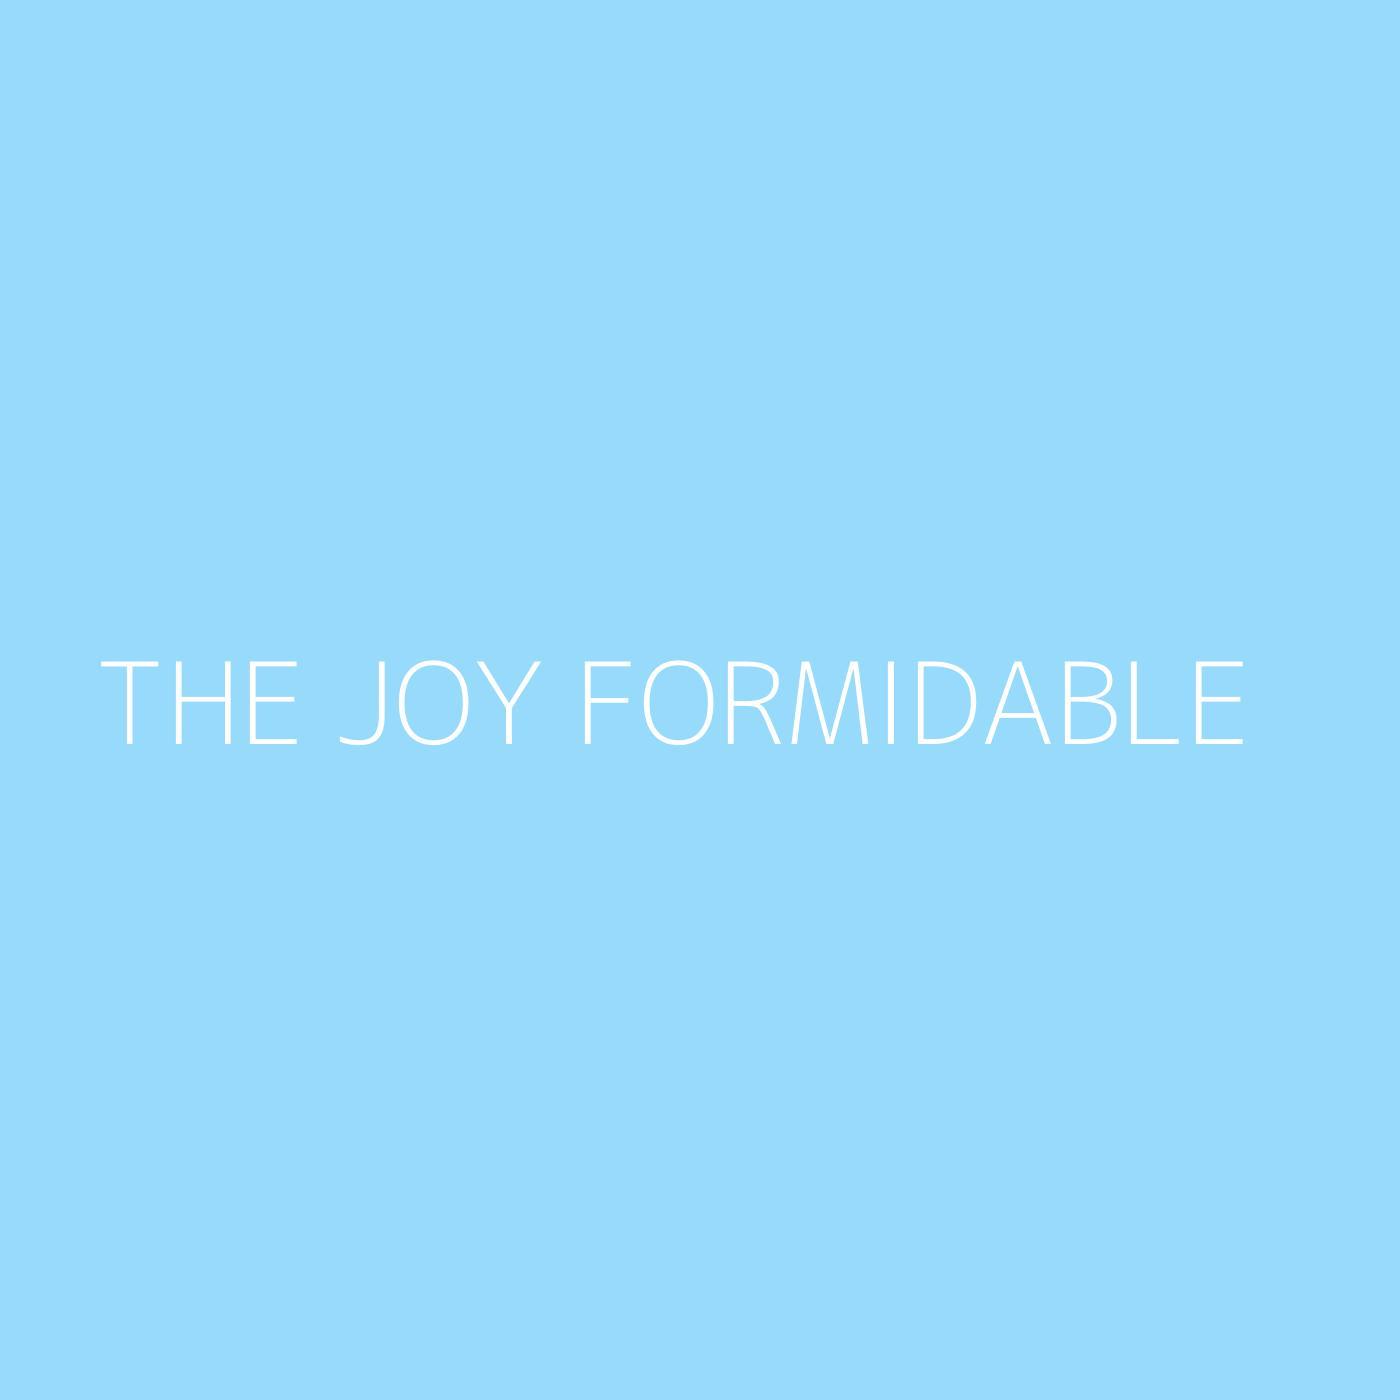 The Joy Formidable Playlist Artwork